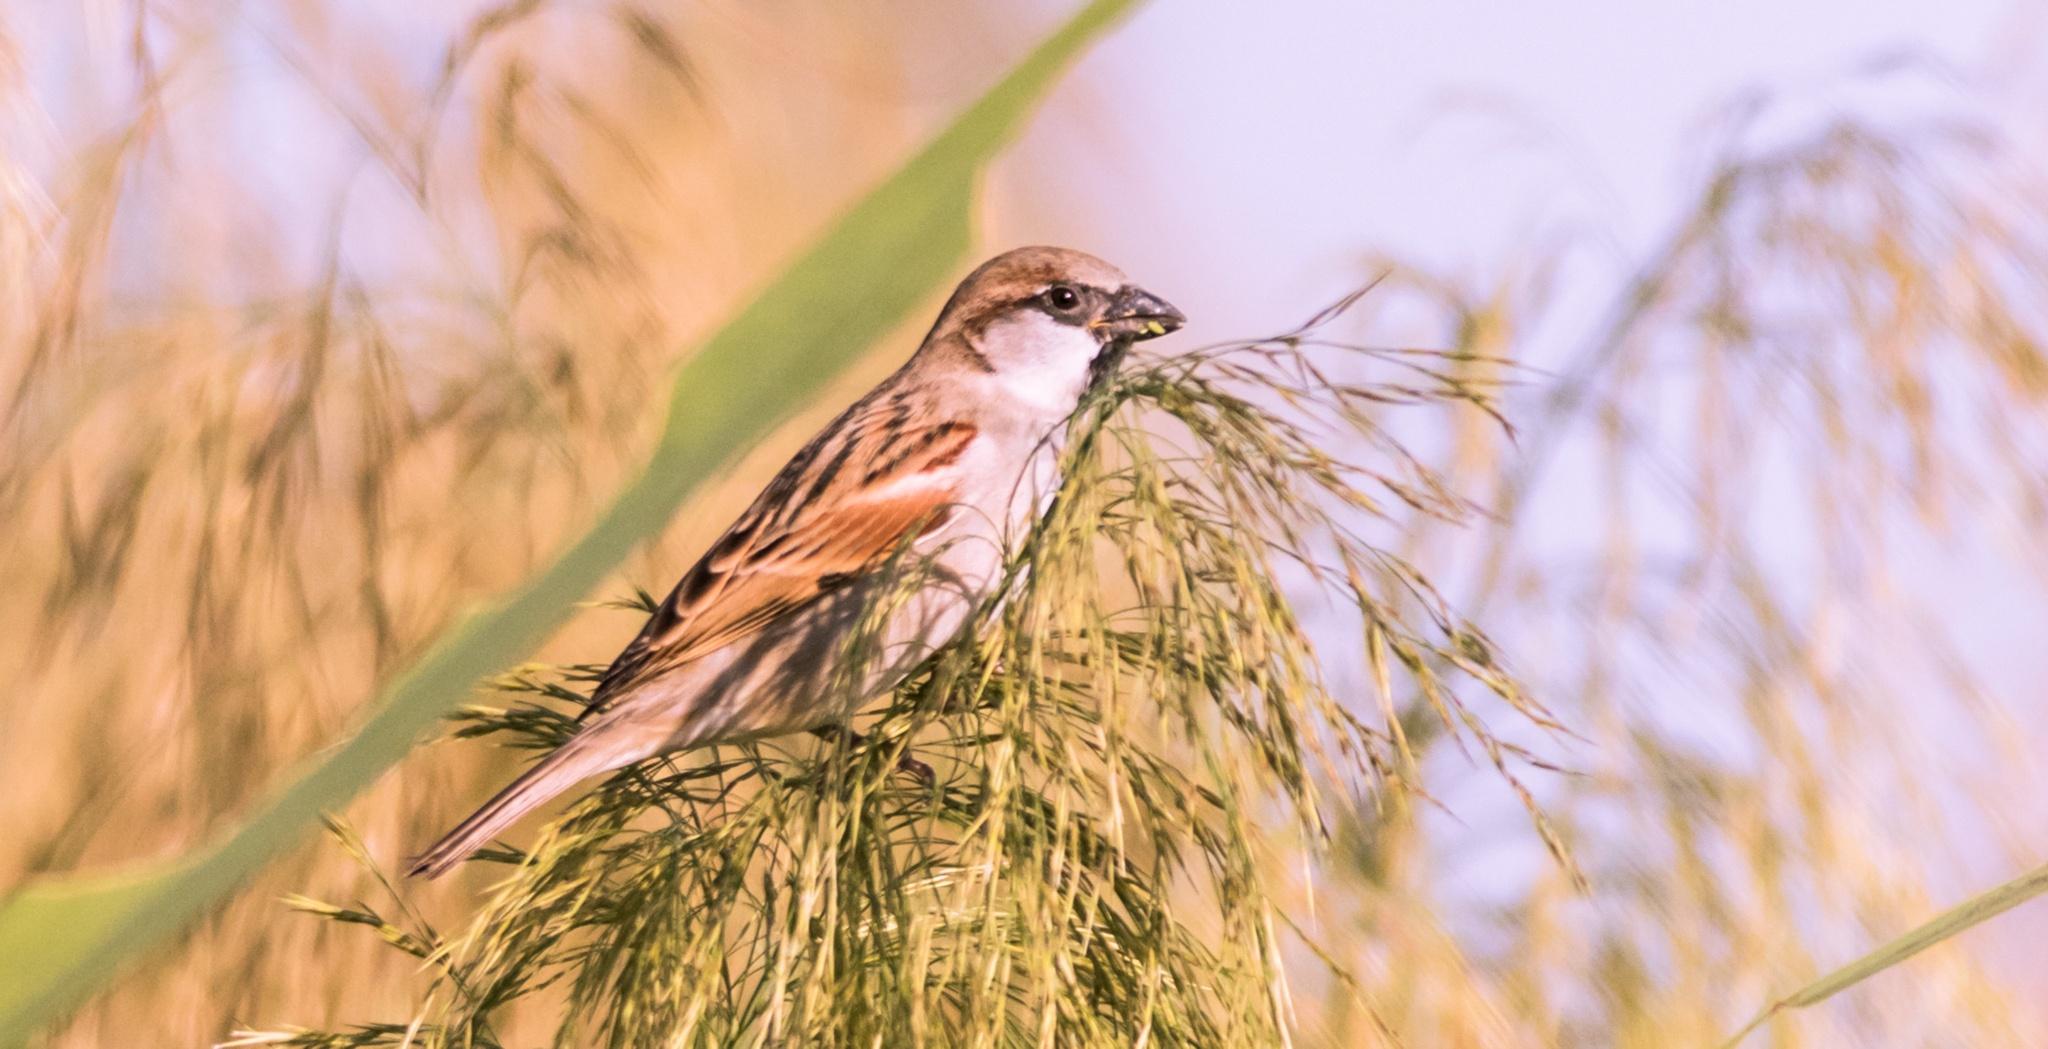 spanish sparrow male by Sajeev Kumar